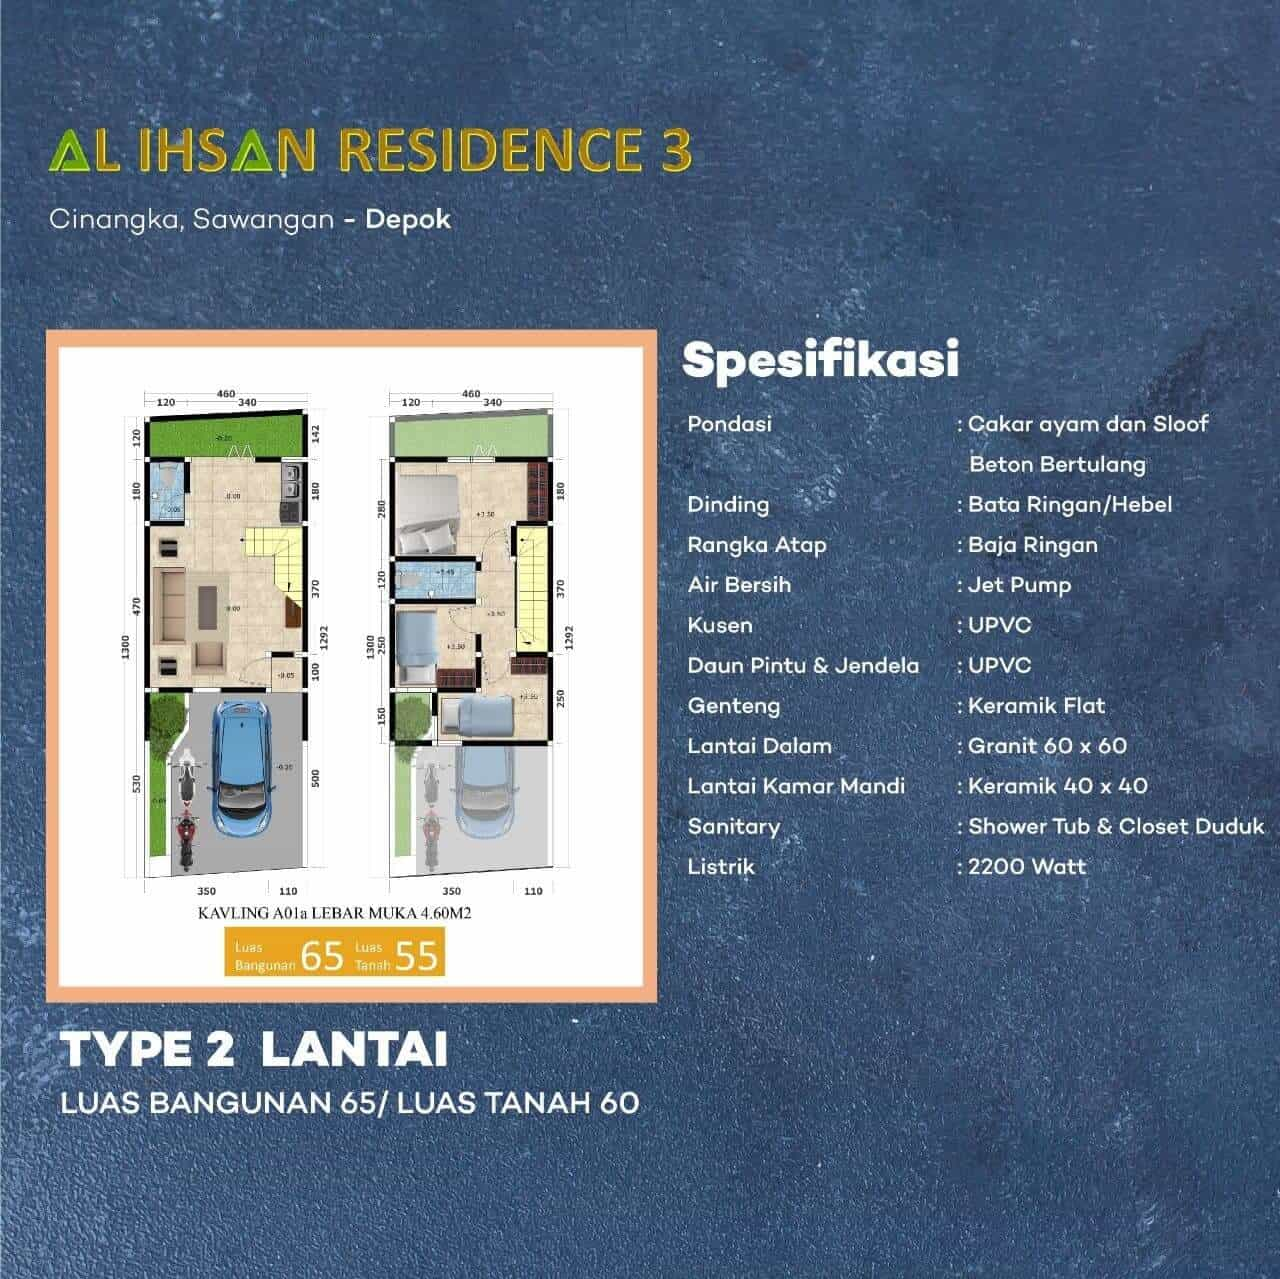 perumahan-syariah-depok-perumahan-islami-depok-kpr-syariah-depok-siteplan-al-ihsan-residence-3-dav-property-syariah (7)